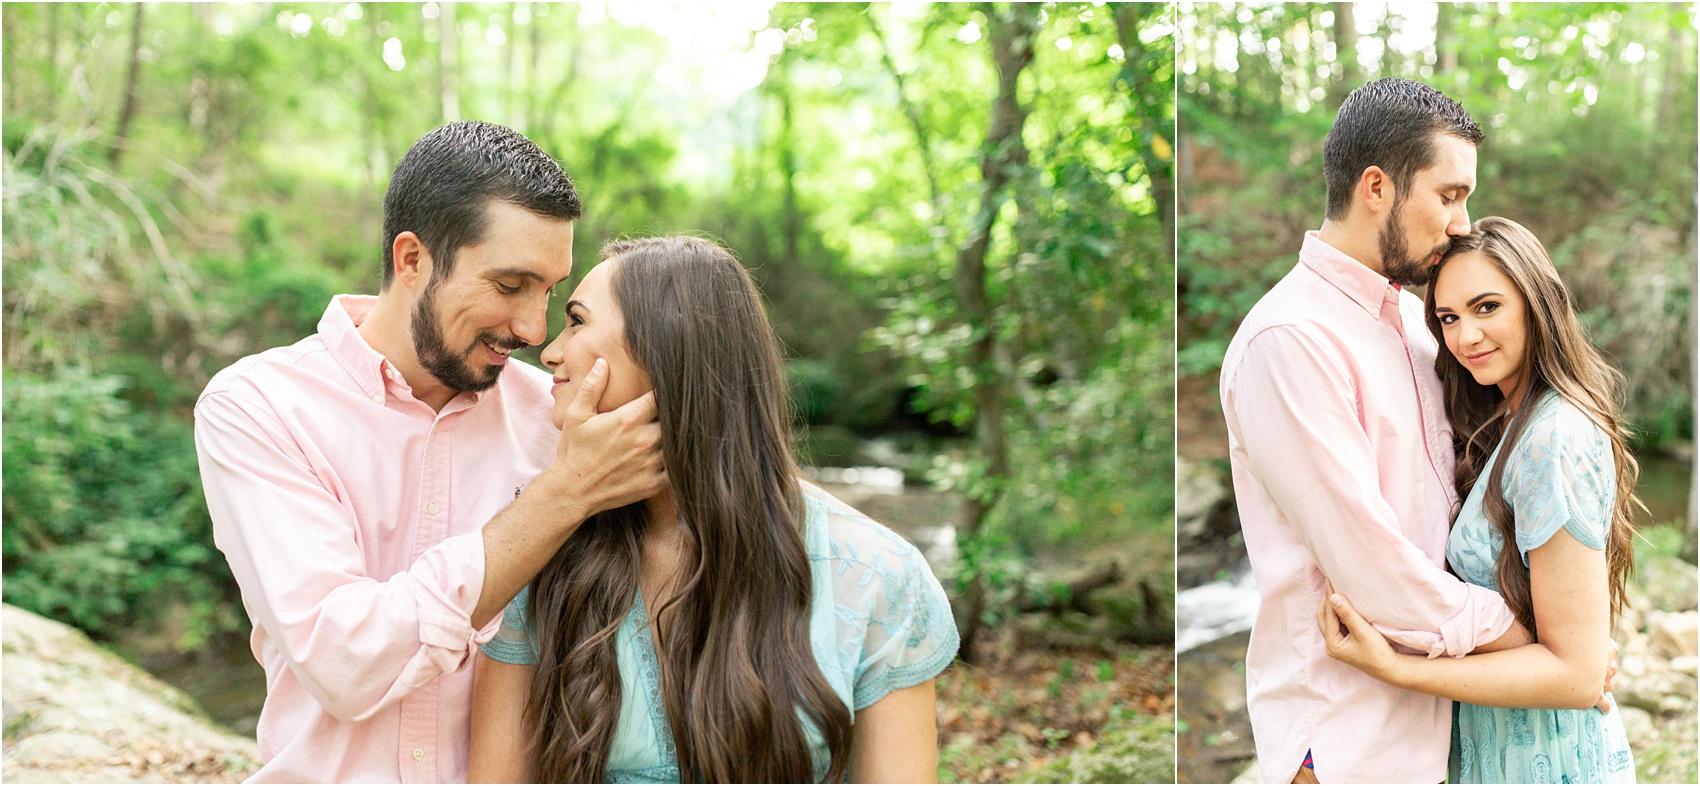 Savannah Eve Photography LLC- Tiffani & Josh Beck @ The Walters Barn- Blog-7.jpg